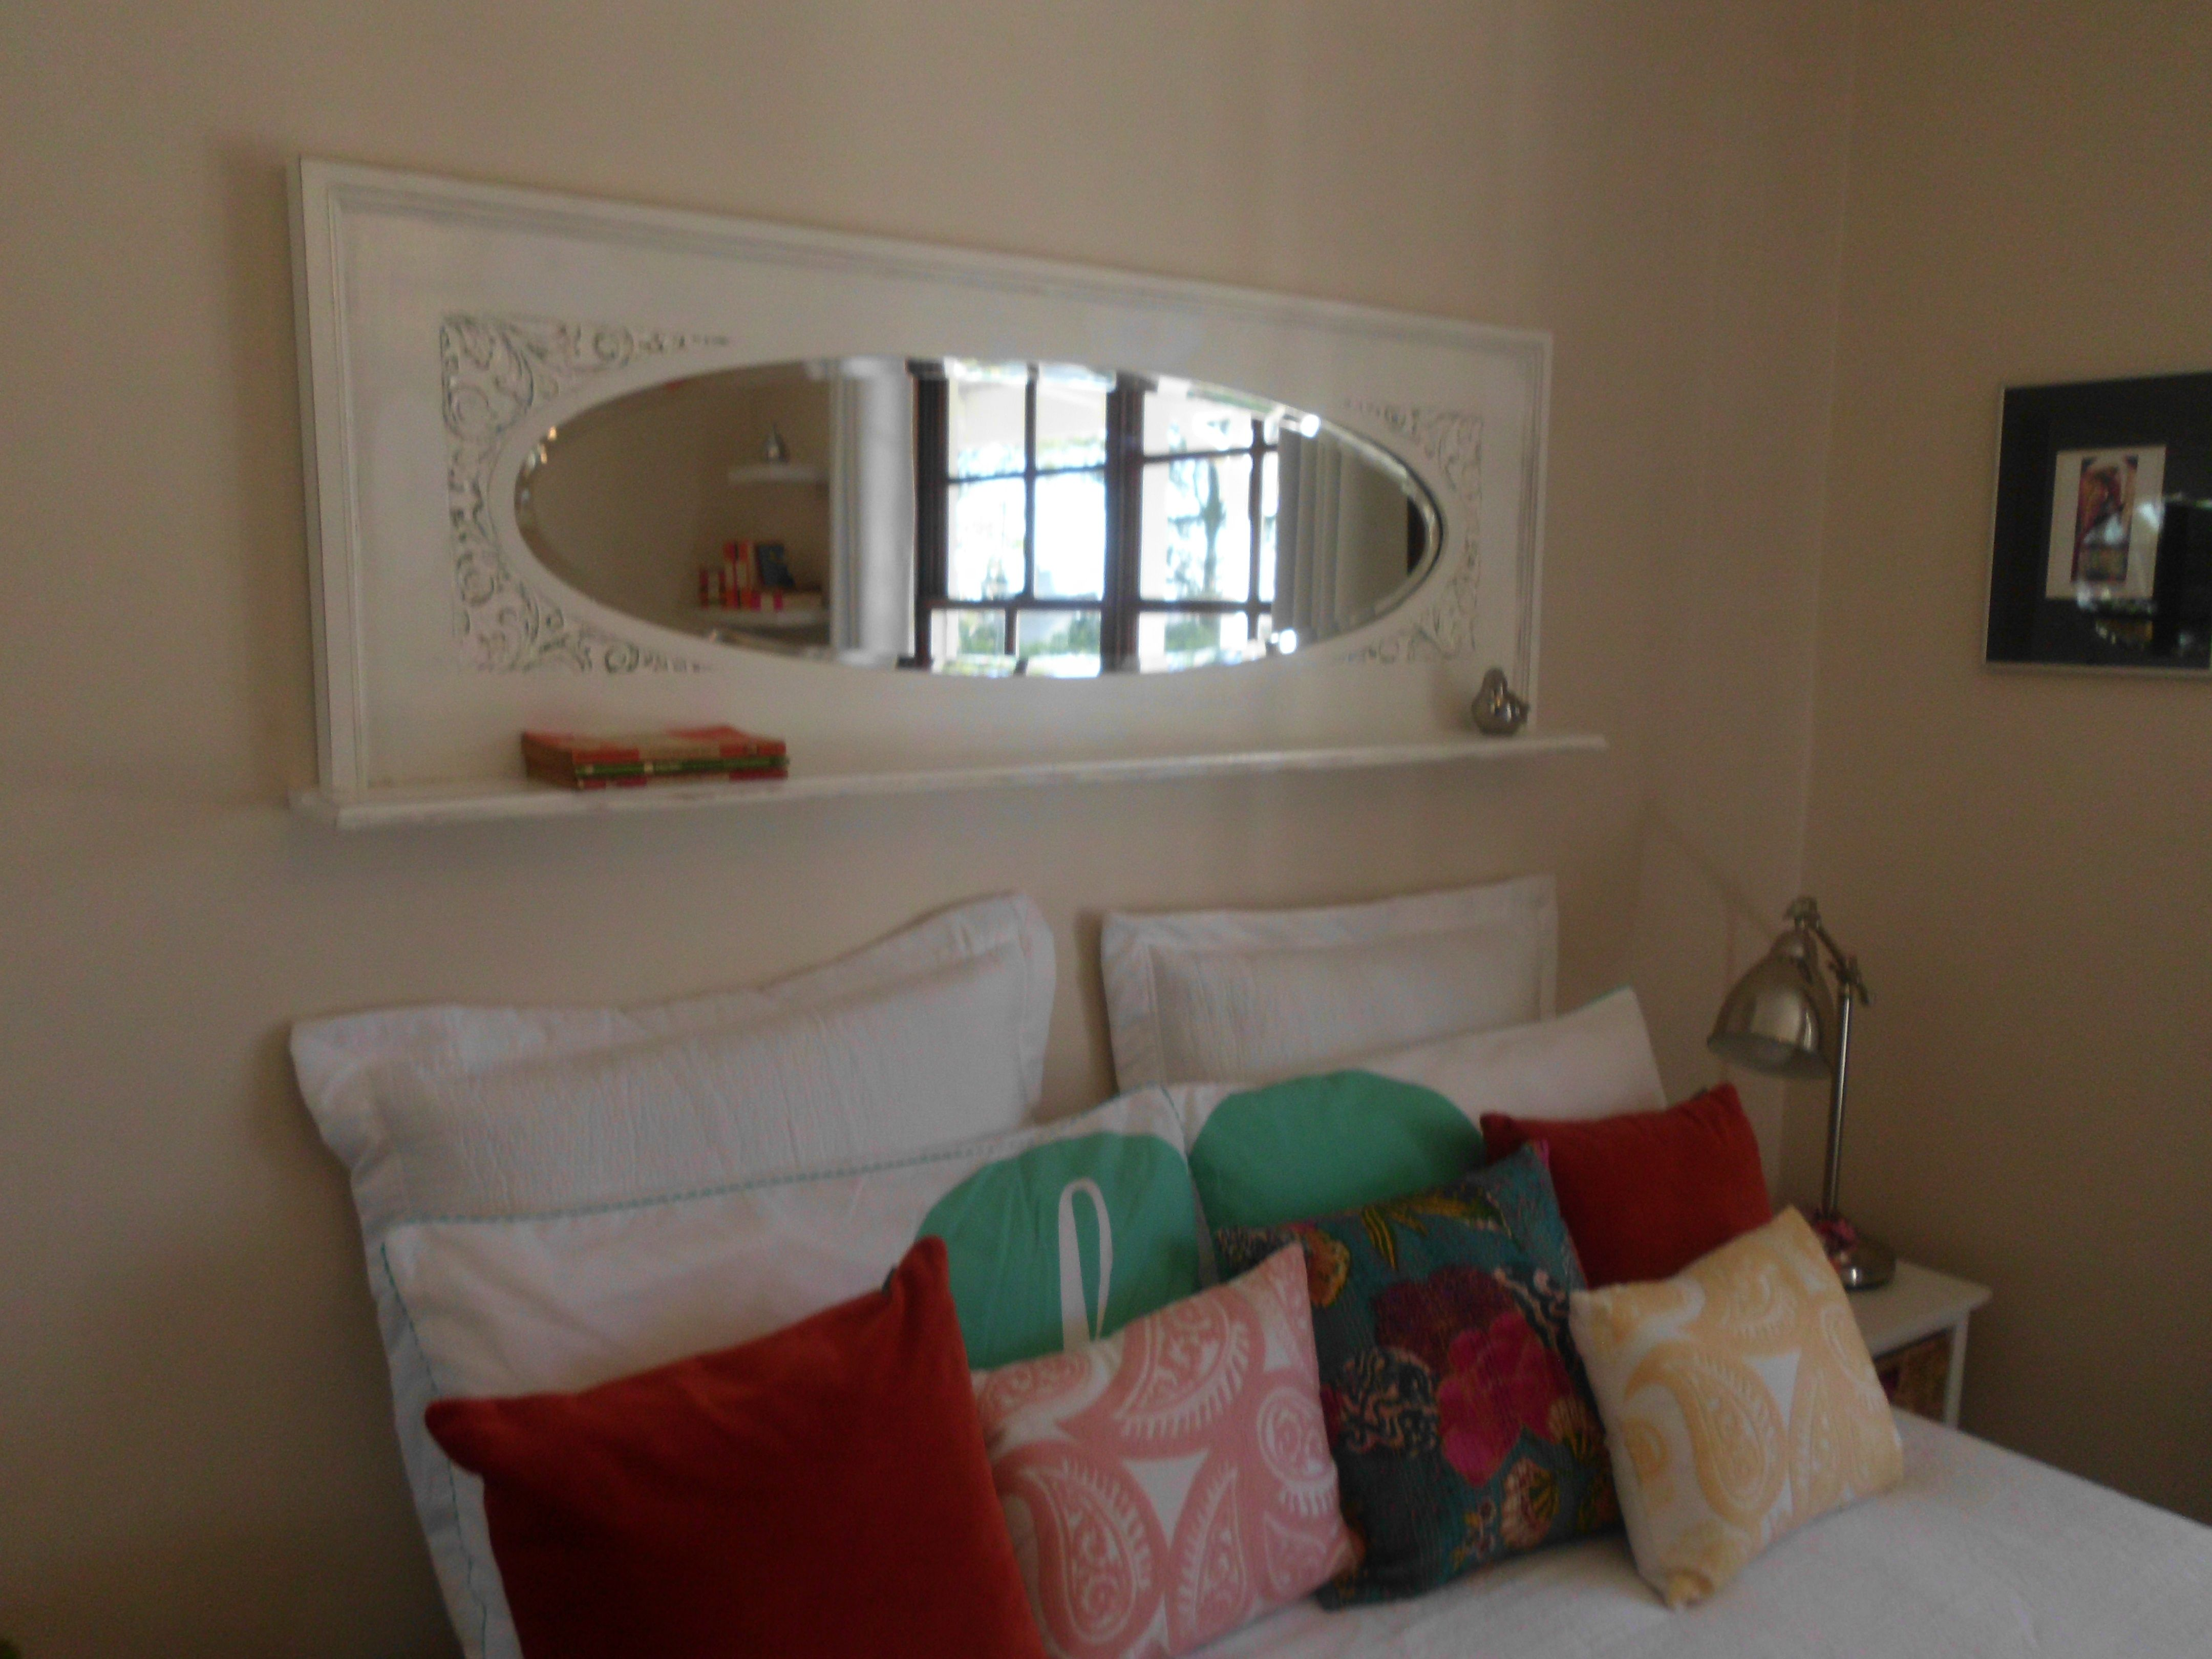 Mantelpiece DIY bedhead & Mantelpiece DIY bedhead | Home dec | Pinterest | Bedhead DIY ...